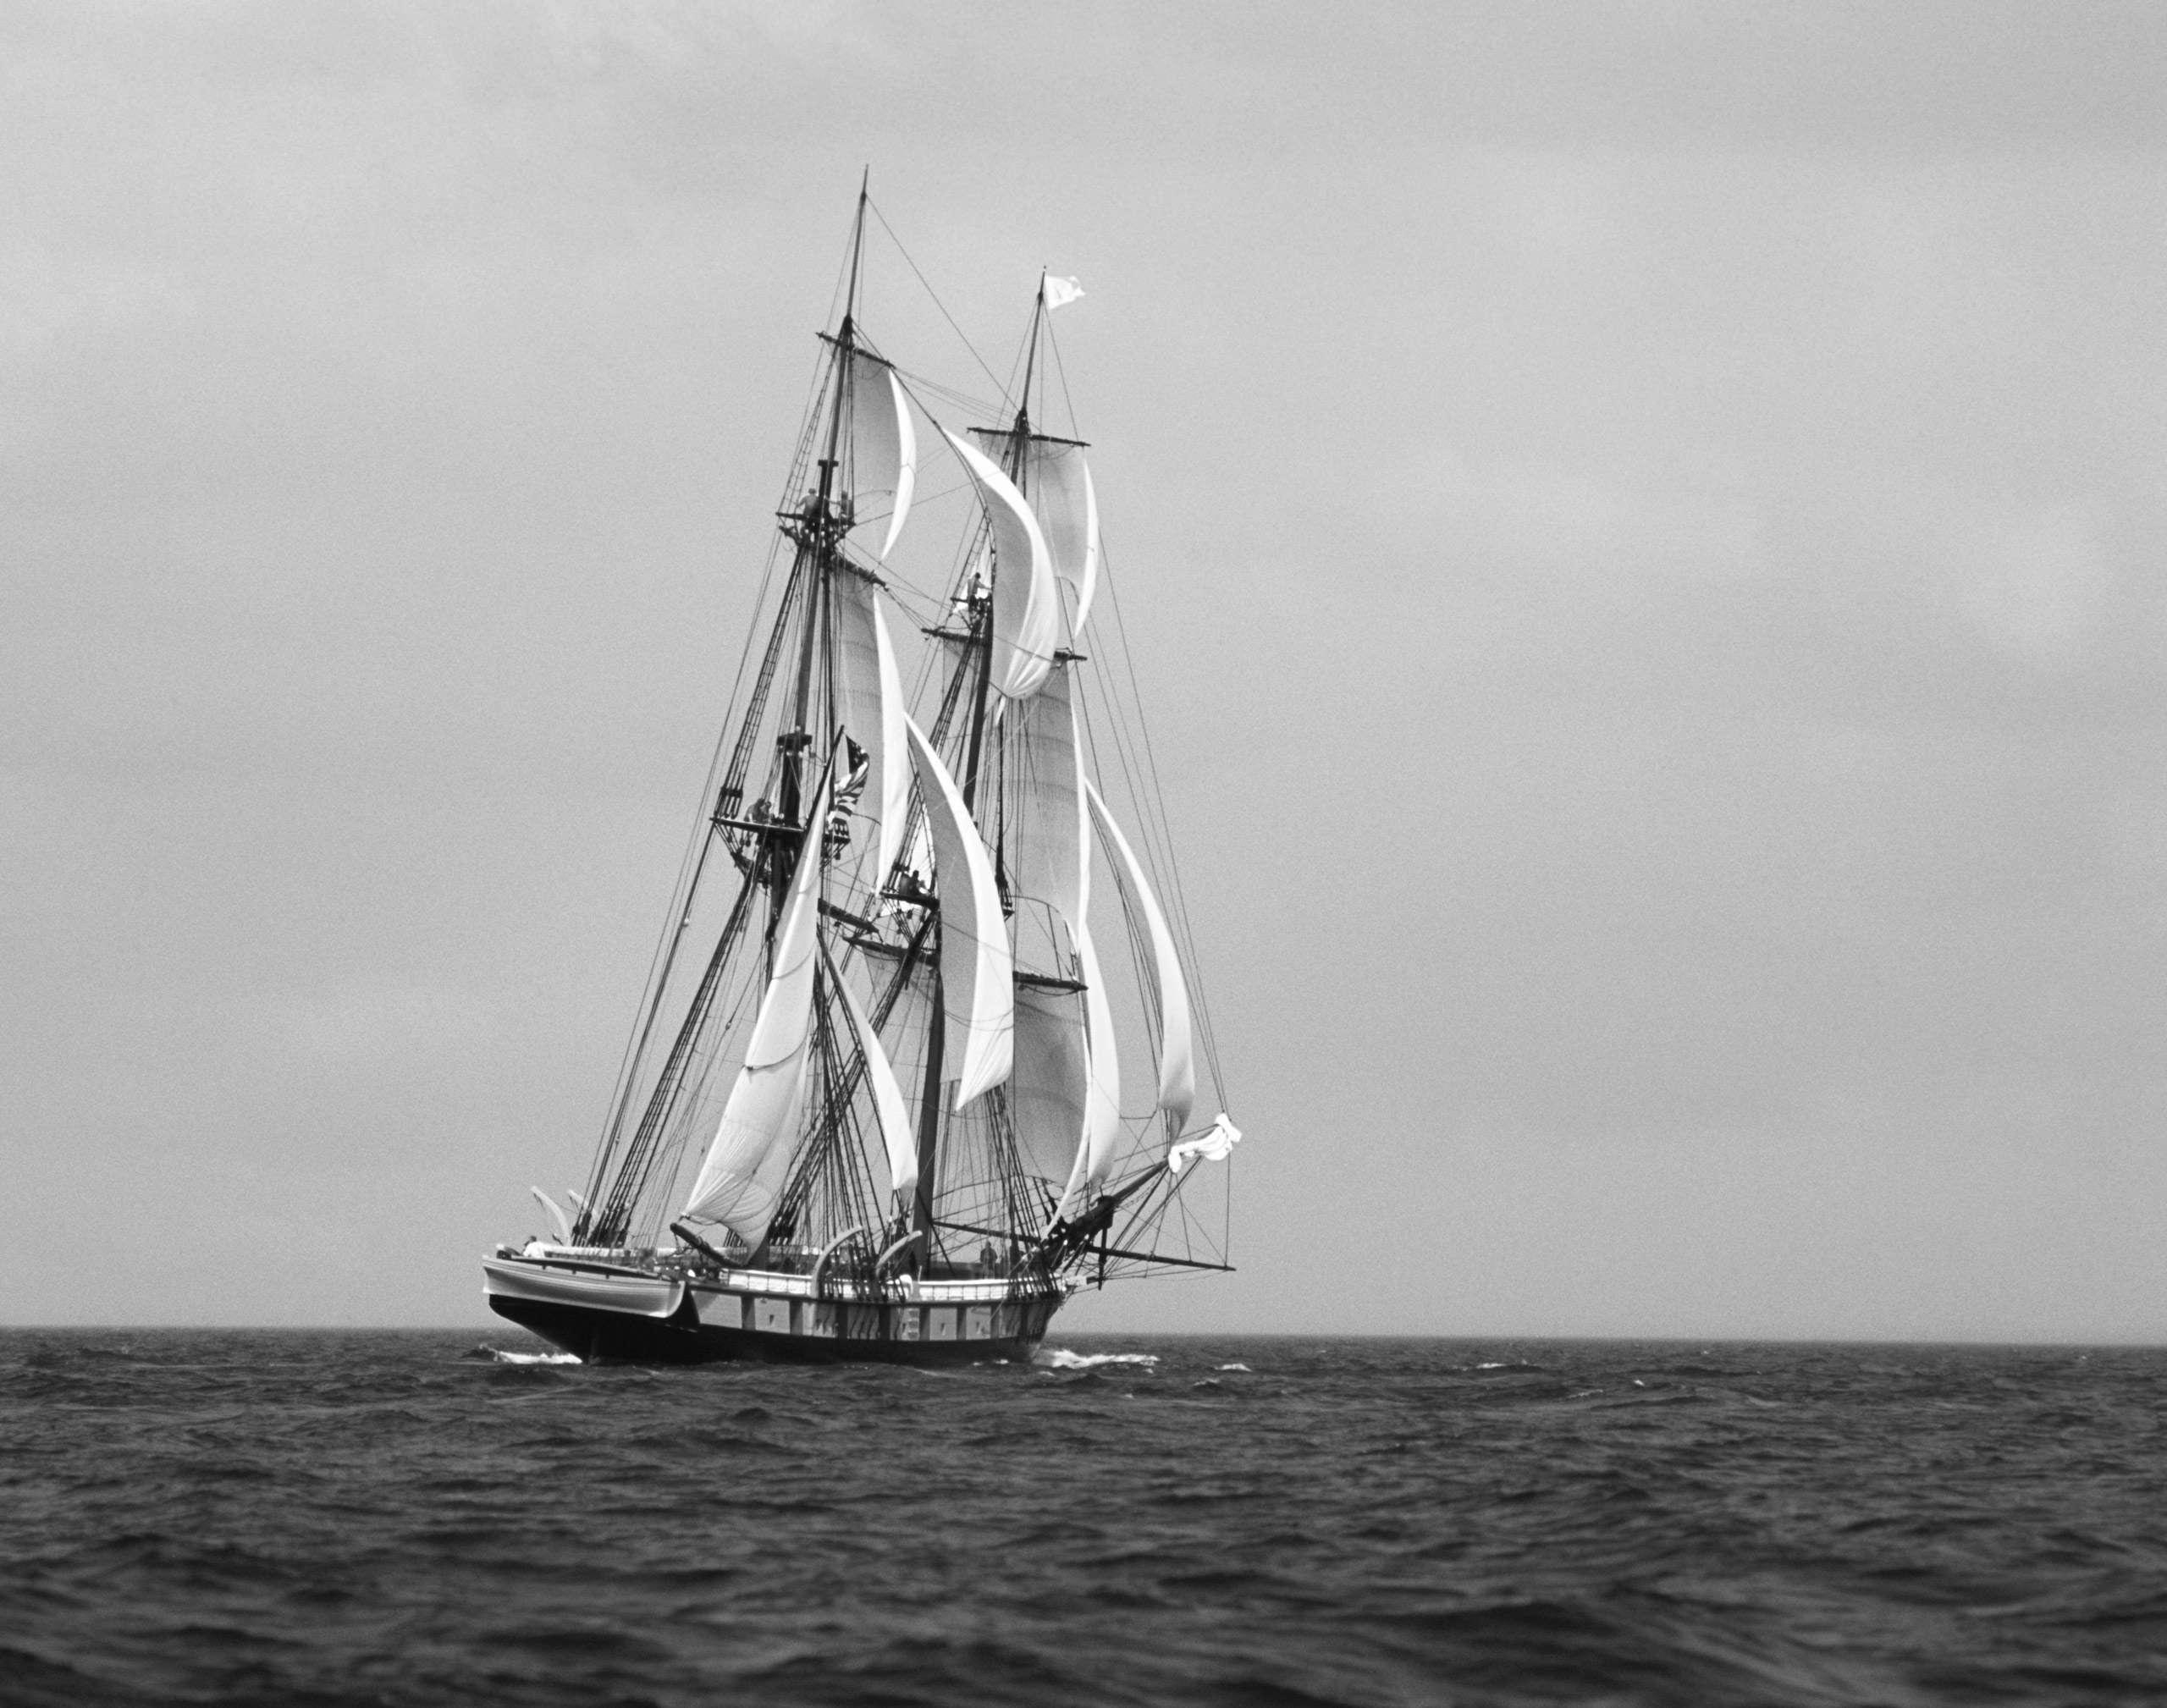 PORTFOLIO - Sailing - Tall Ships #25-PCG258